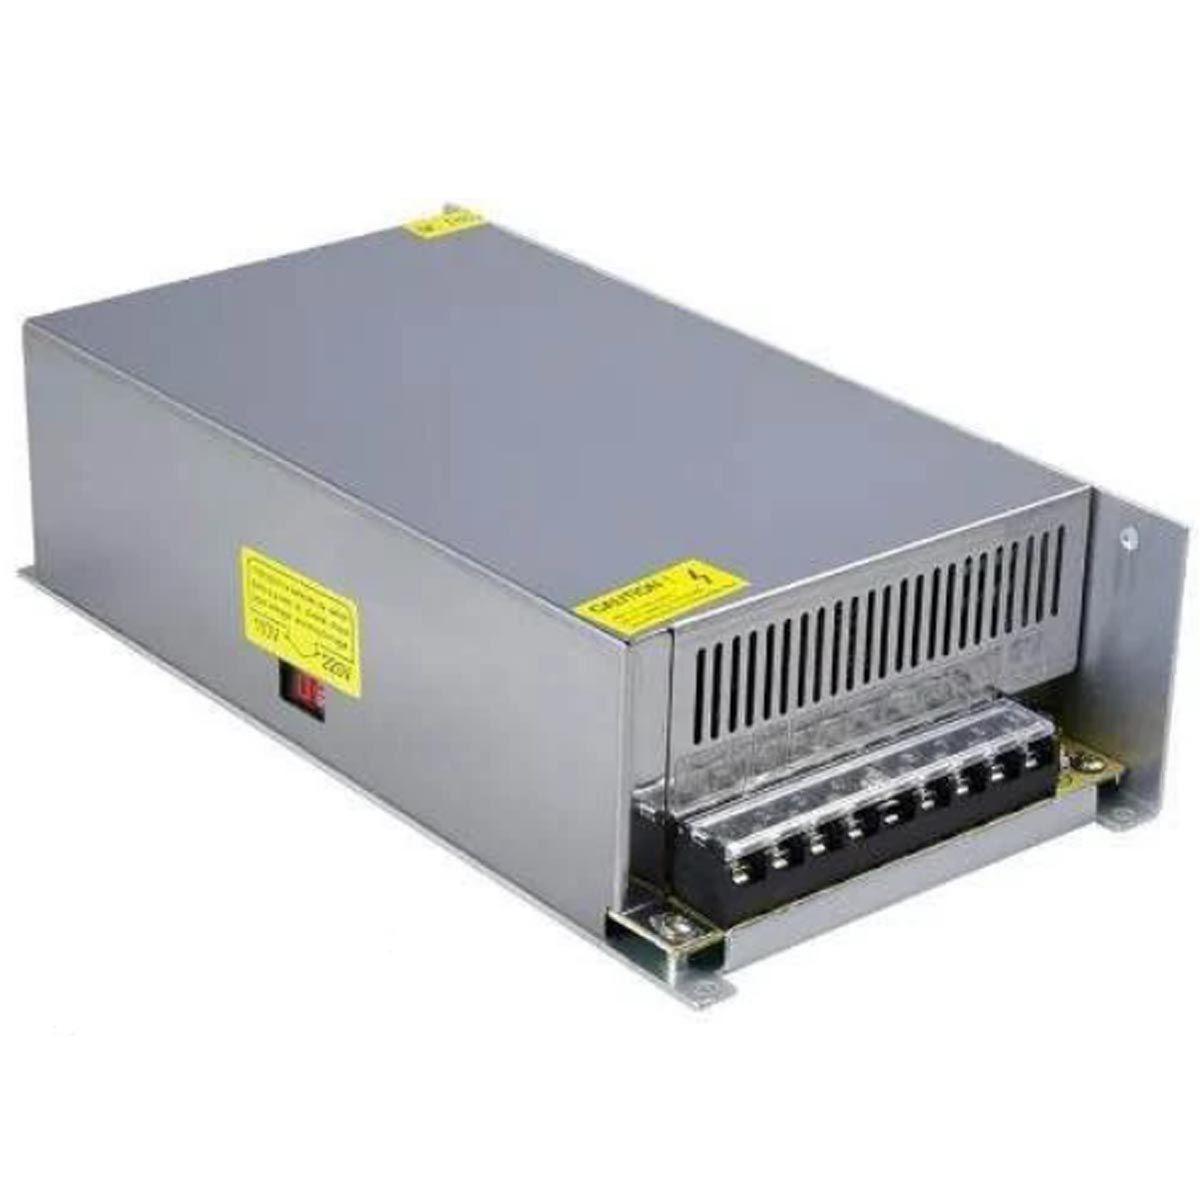 Fonte 50 Ampere Chaveada  c/cooler 12 volts  600 watts 110v/220v